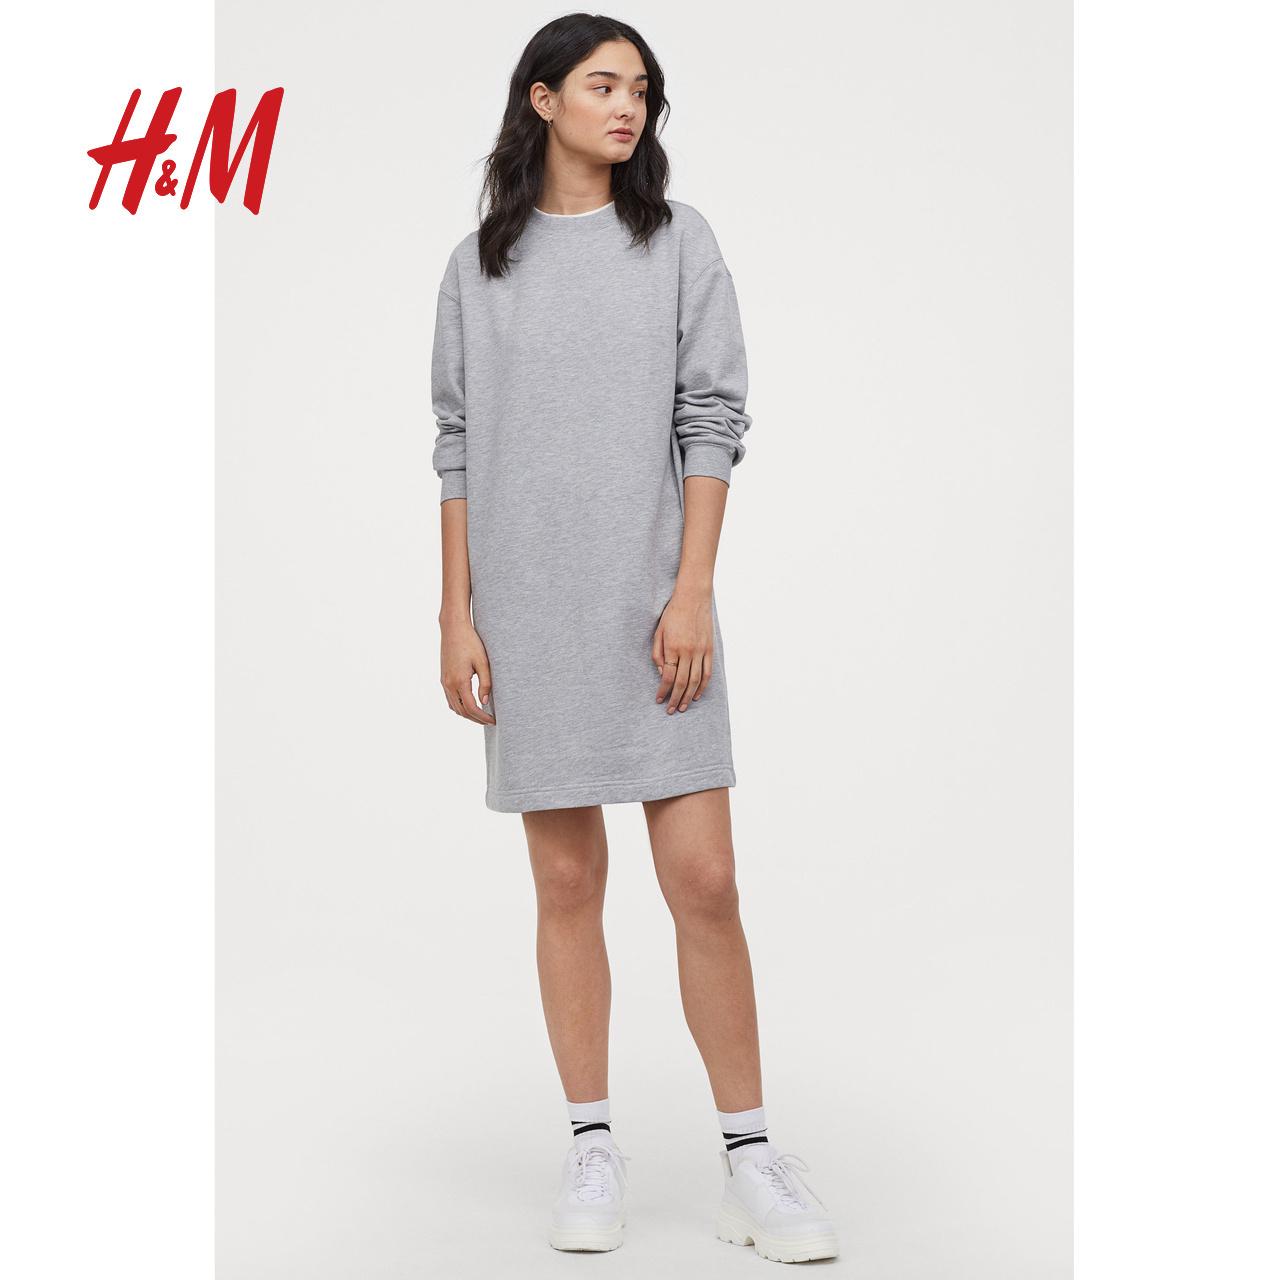 HM DIVIDED女装裙子春秋2020款 卫衣裙连衣裙少女风穿搭0736049